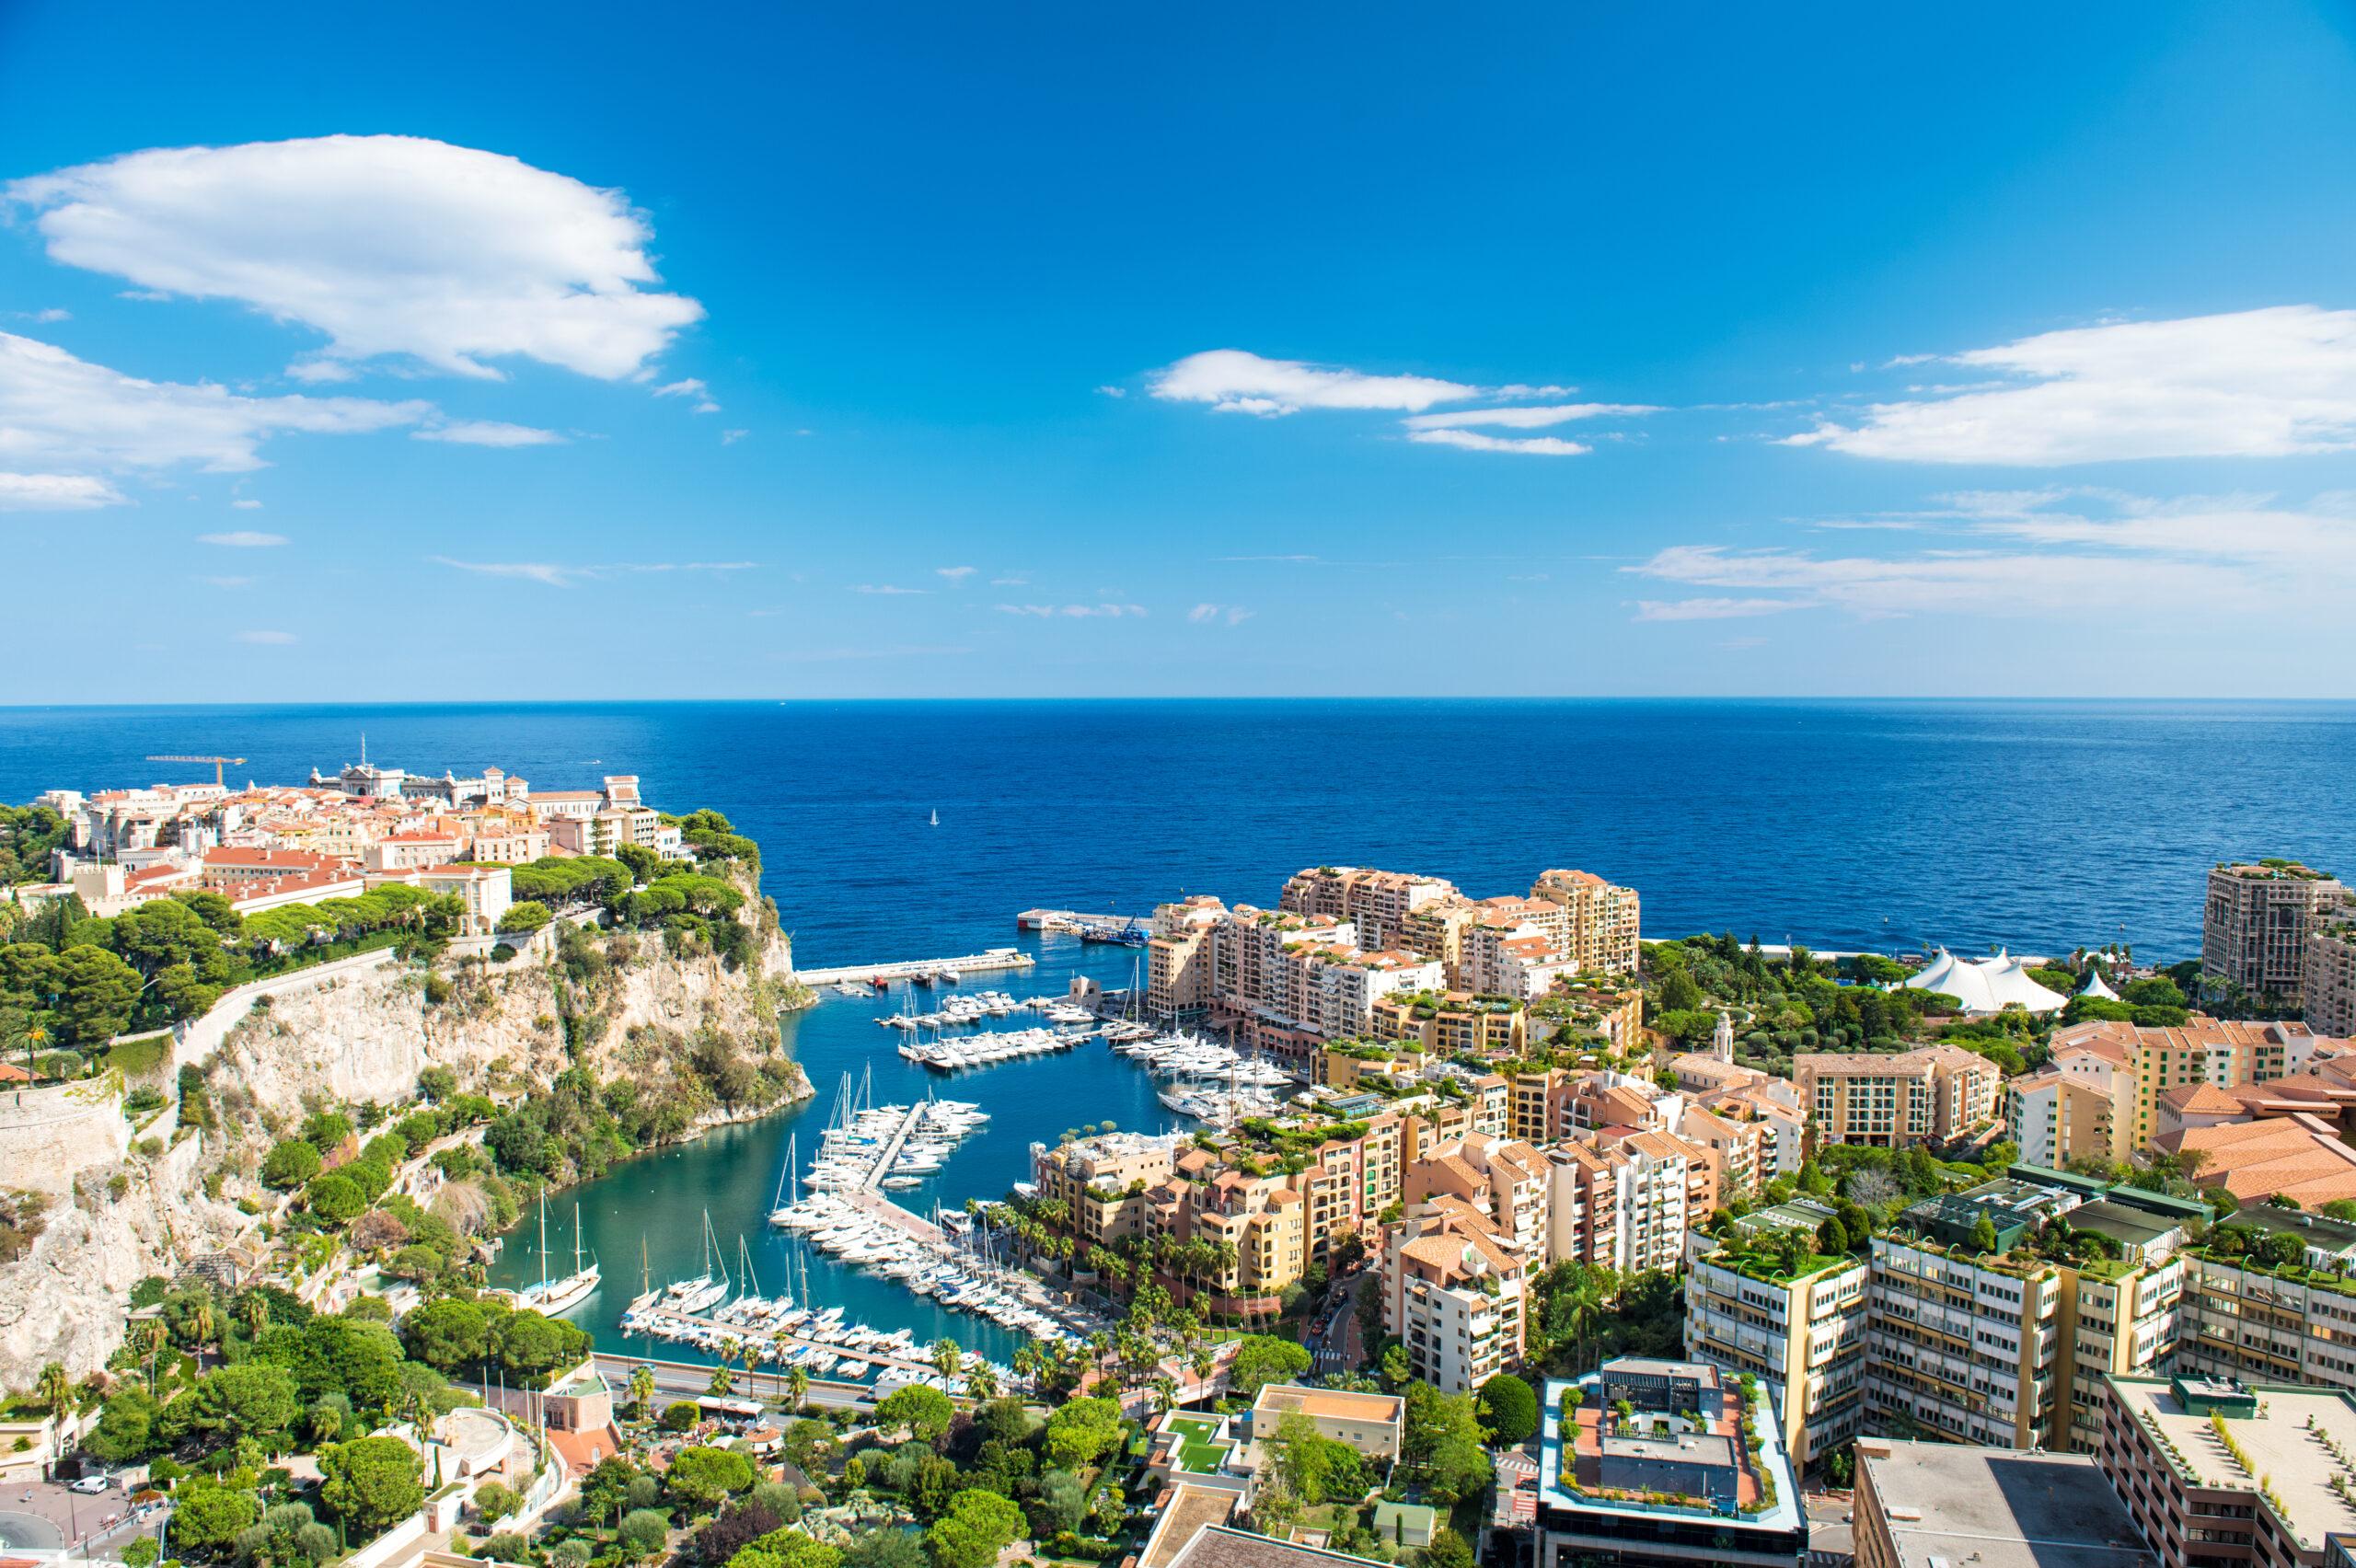 Pourquoi visiter Monaco ?